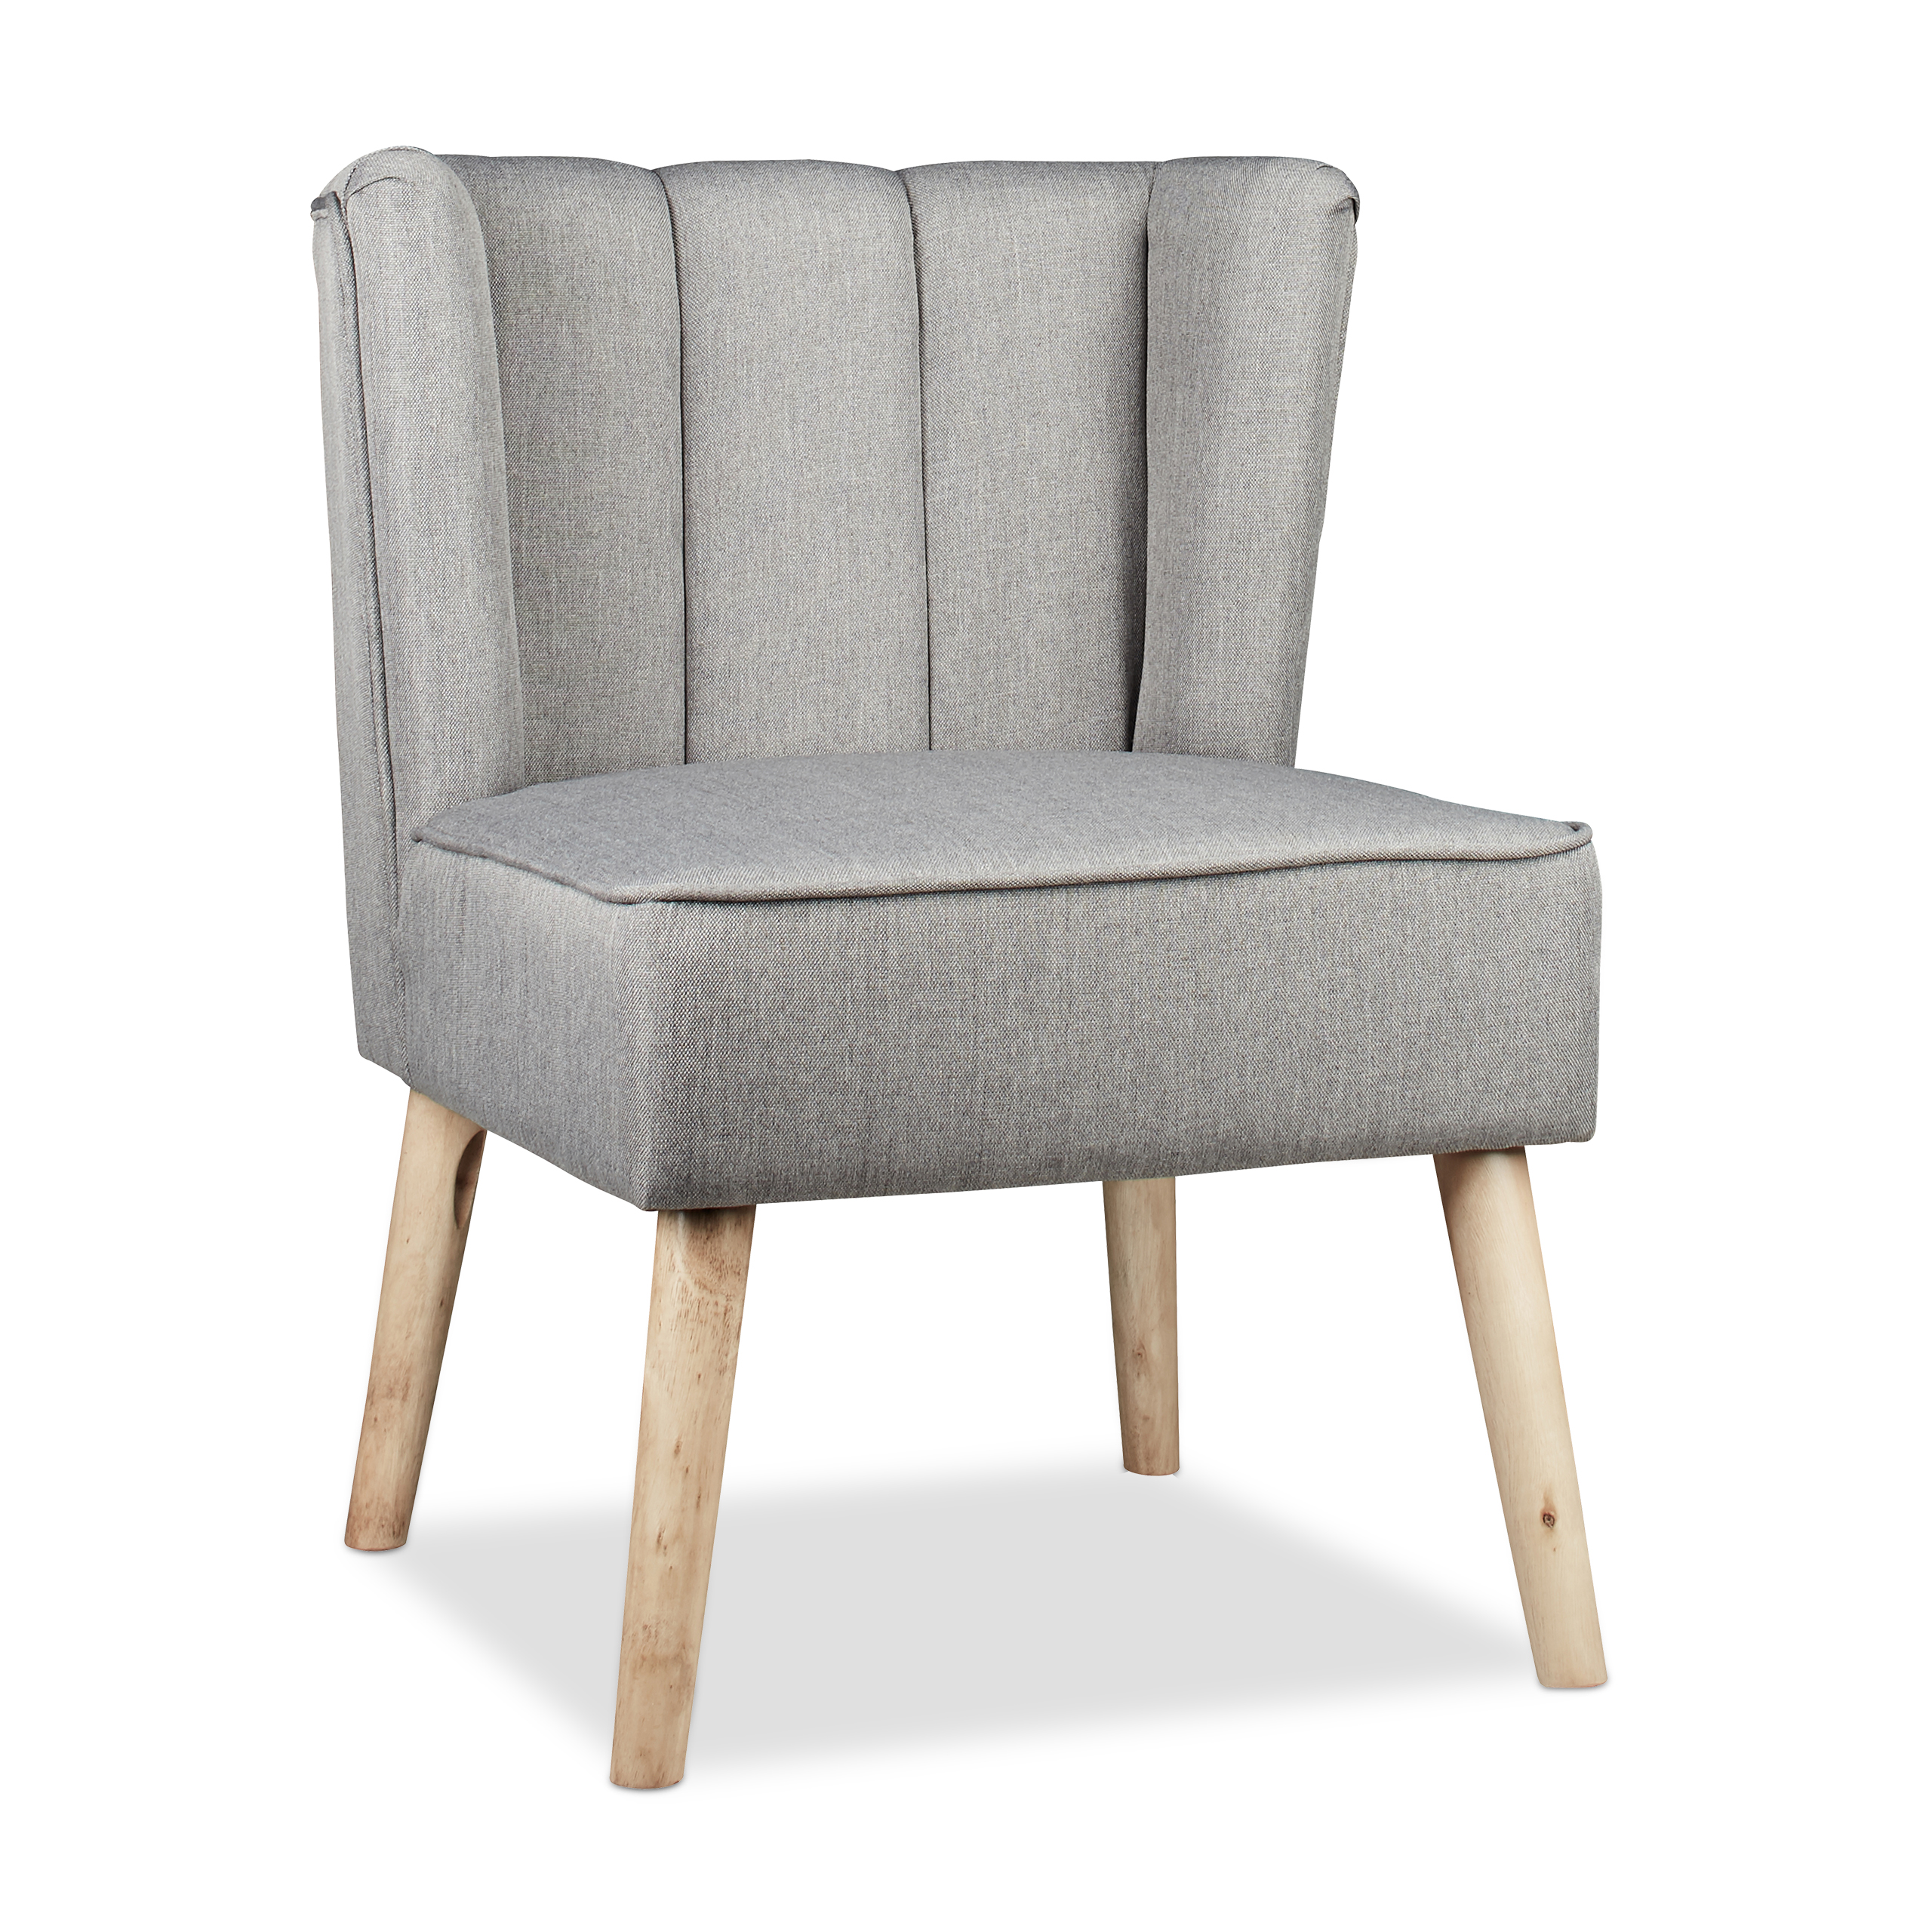 ohrensessel retro 50er grau sessel loungesessel relaxsessel polstersessel ebay. Black Bedroom Furniture Sets. Home Design Ideas